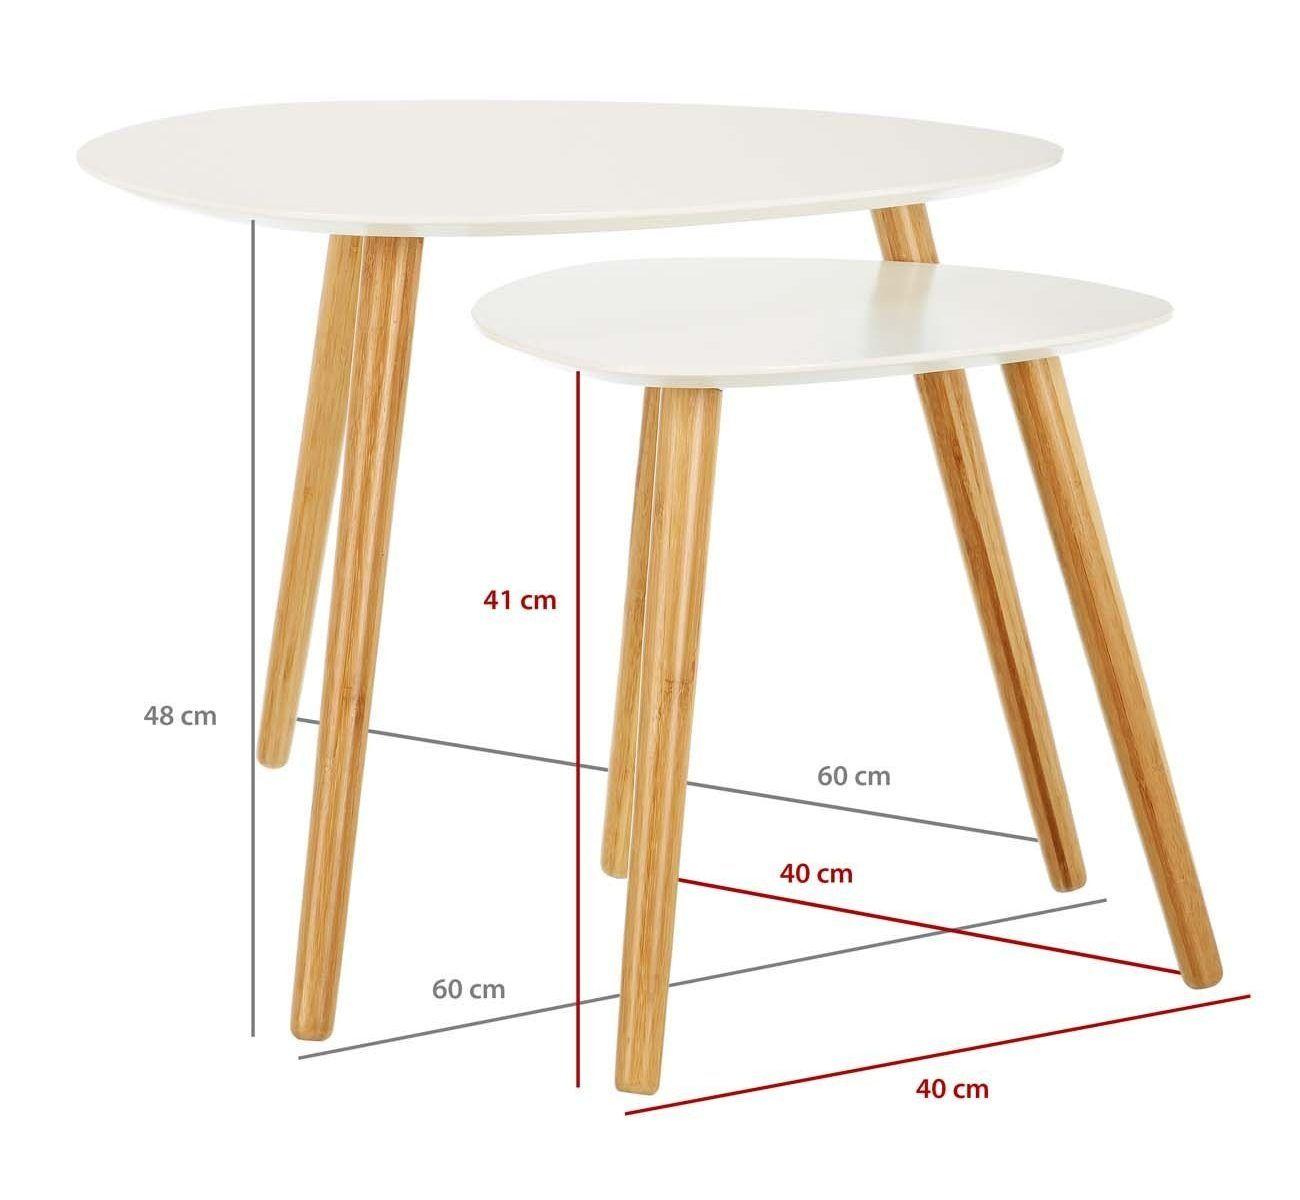 Mesas de centro altas blancas a1 es